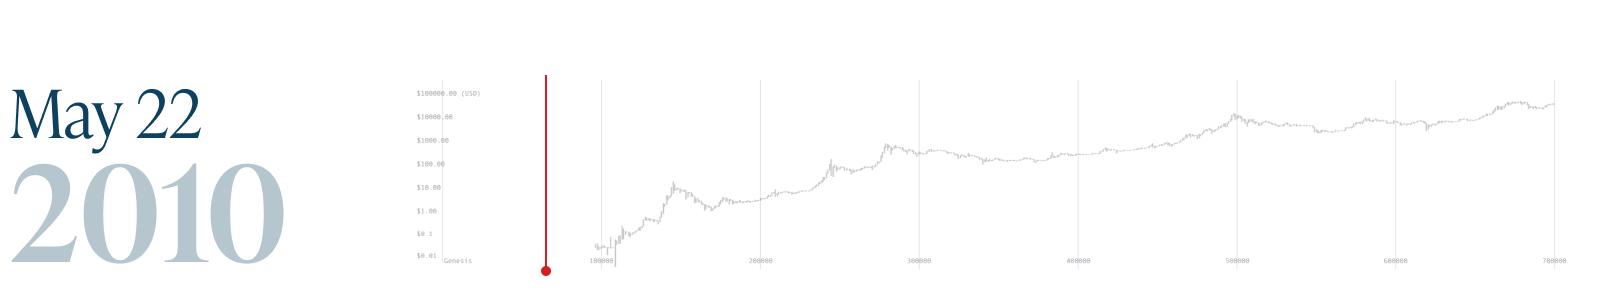 Monochrome_Bitcoin Block 700k_22 May 2010.png